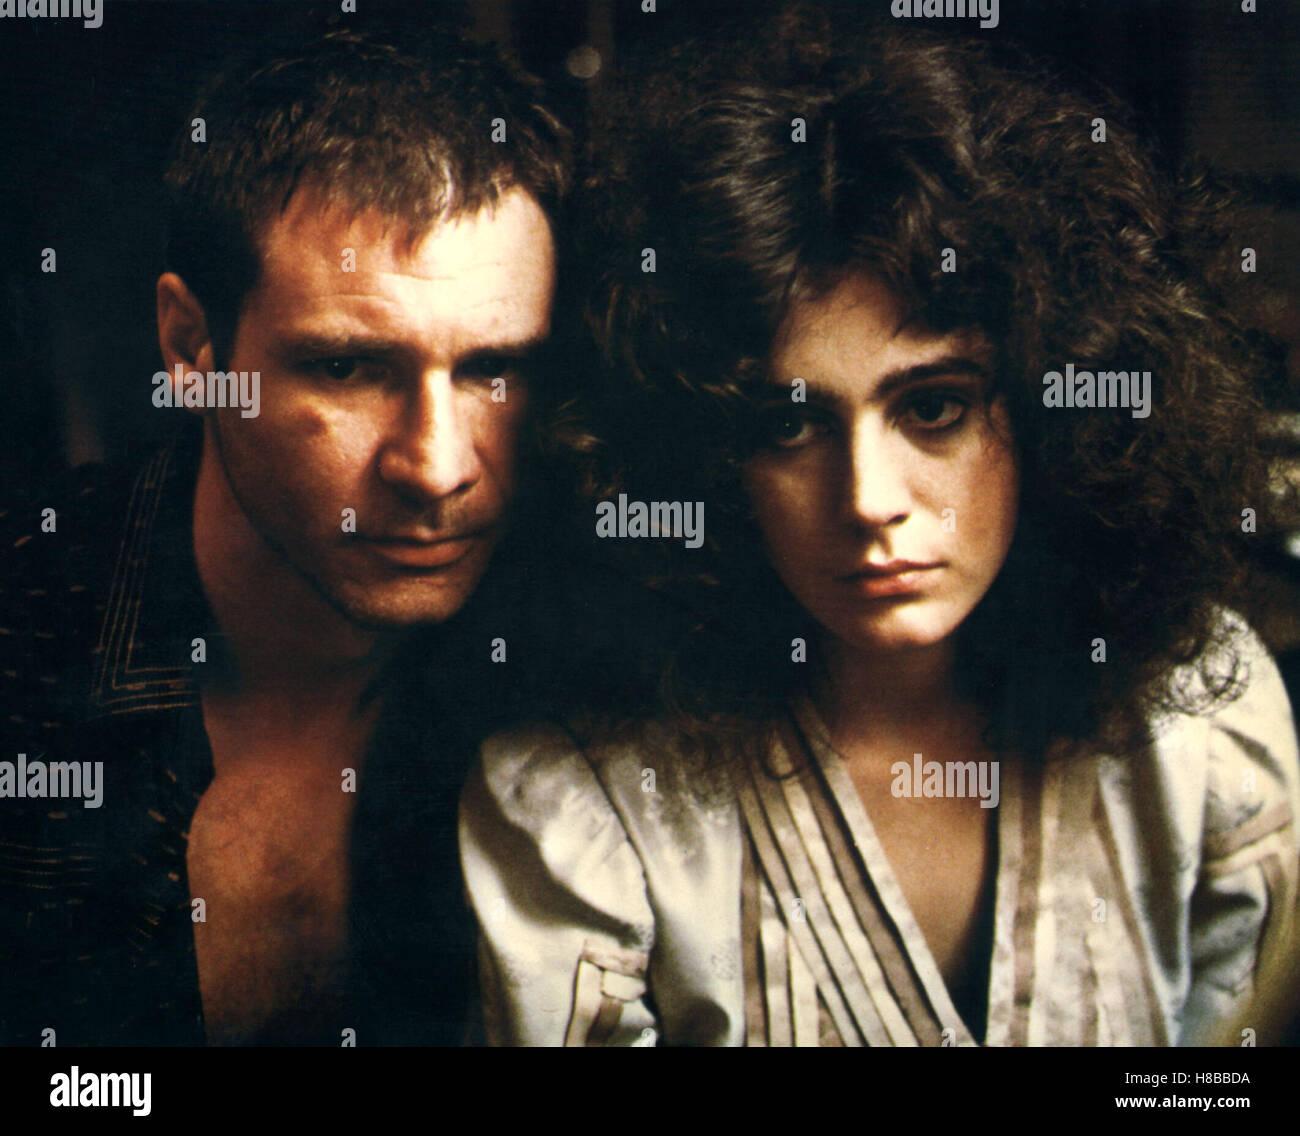 Blade Runner, (BLADE RUNNER) USA 1982, Regie: Ridley Scott, HARRISON FORD, SEAN YOUNG - Stock Image